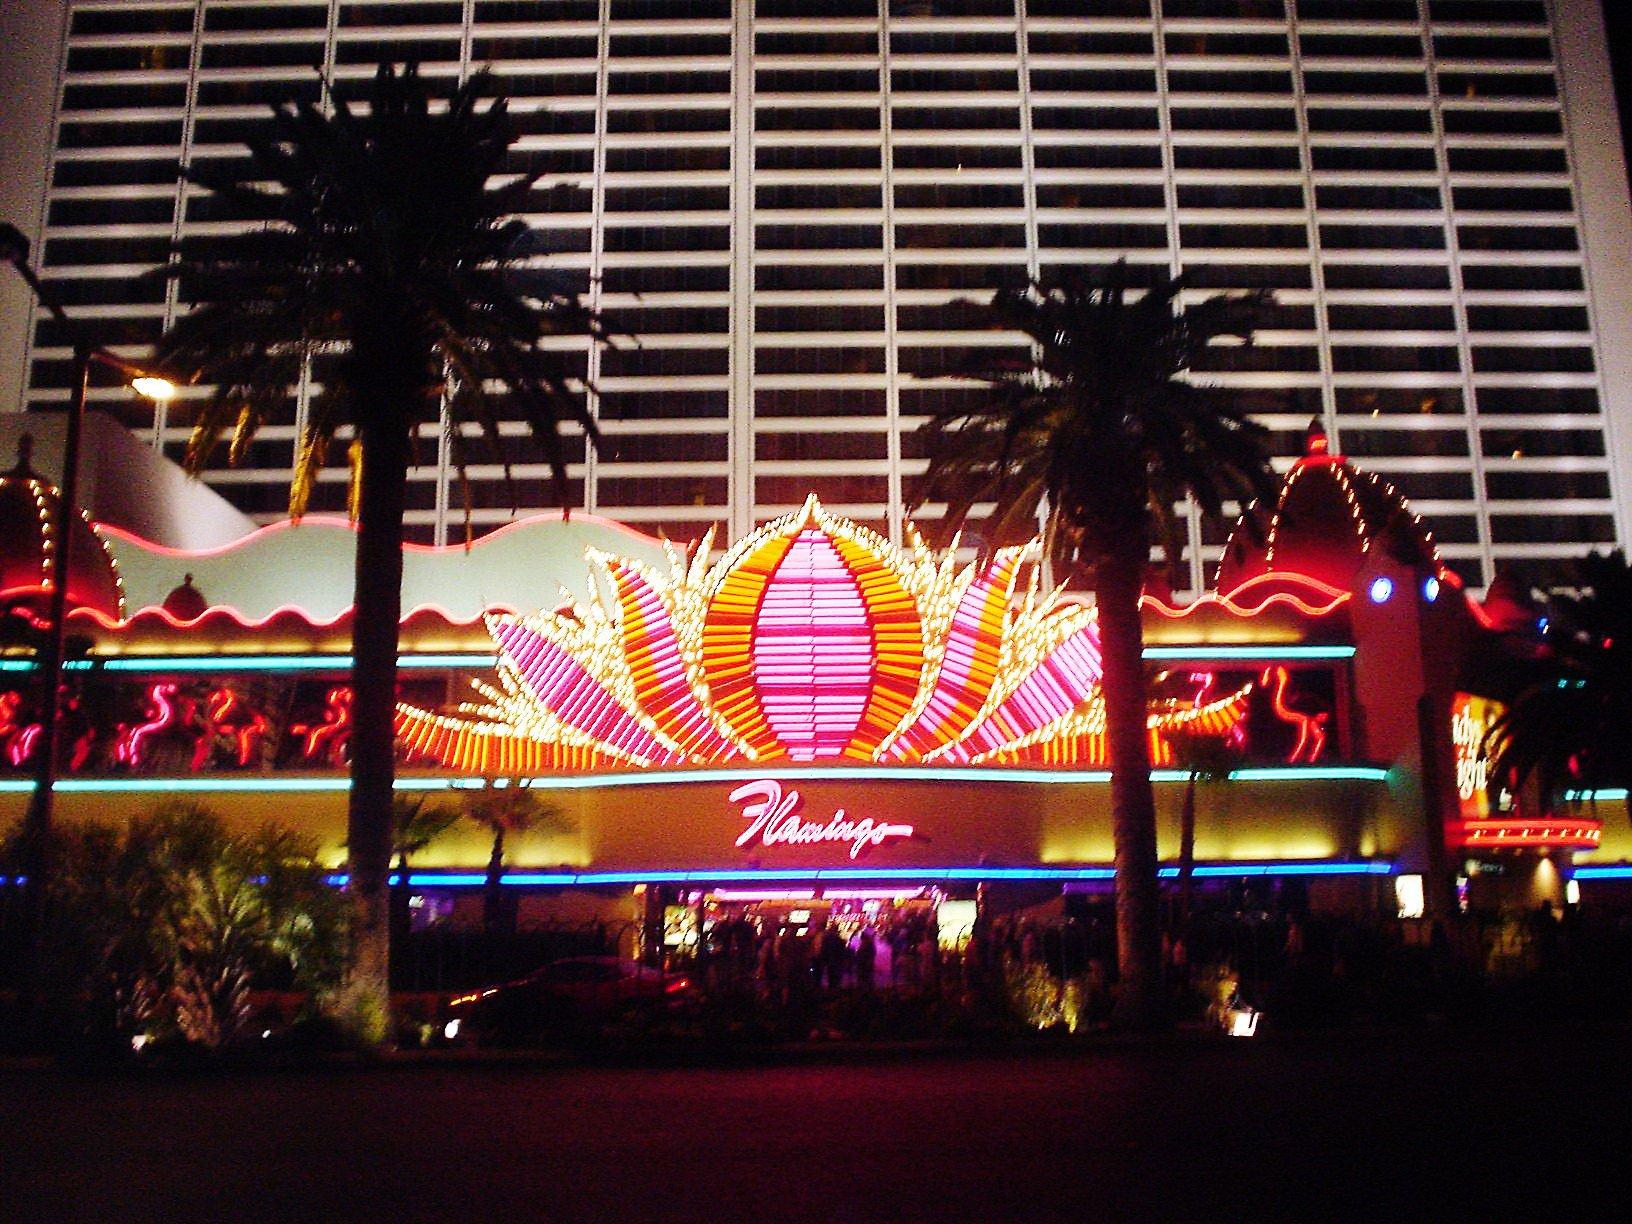 The #flamingo in #lasvegas at night. #flamingolasvegas #casino #lv neon. https://t.co/k31aZcPnck